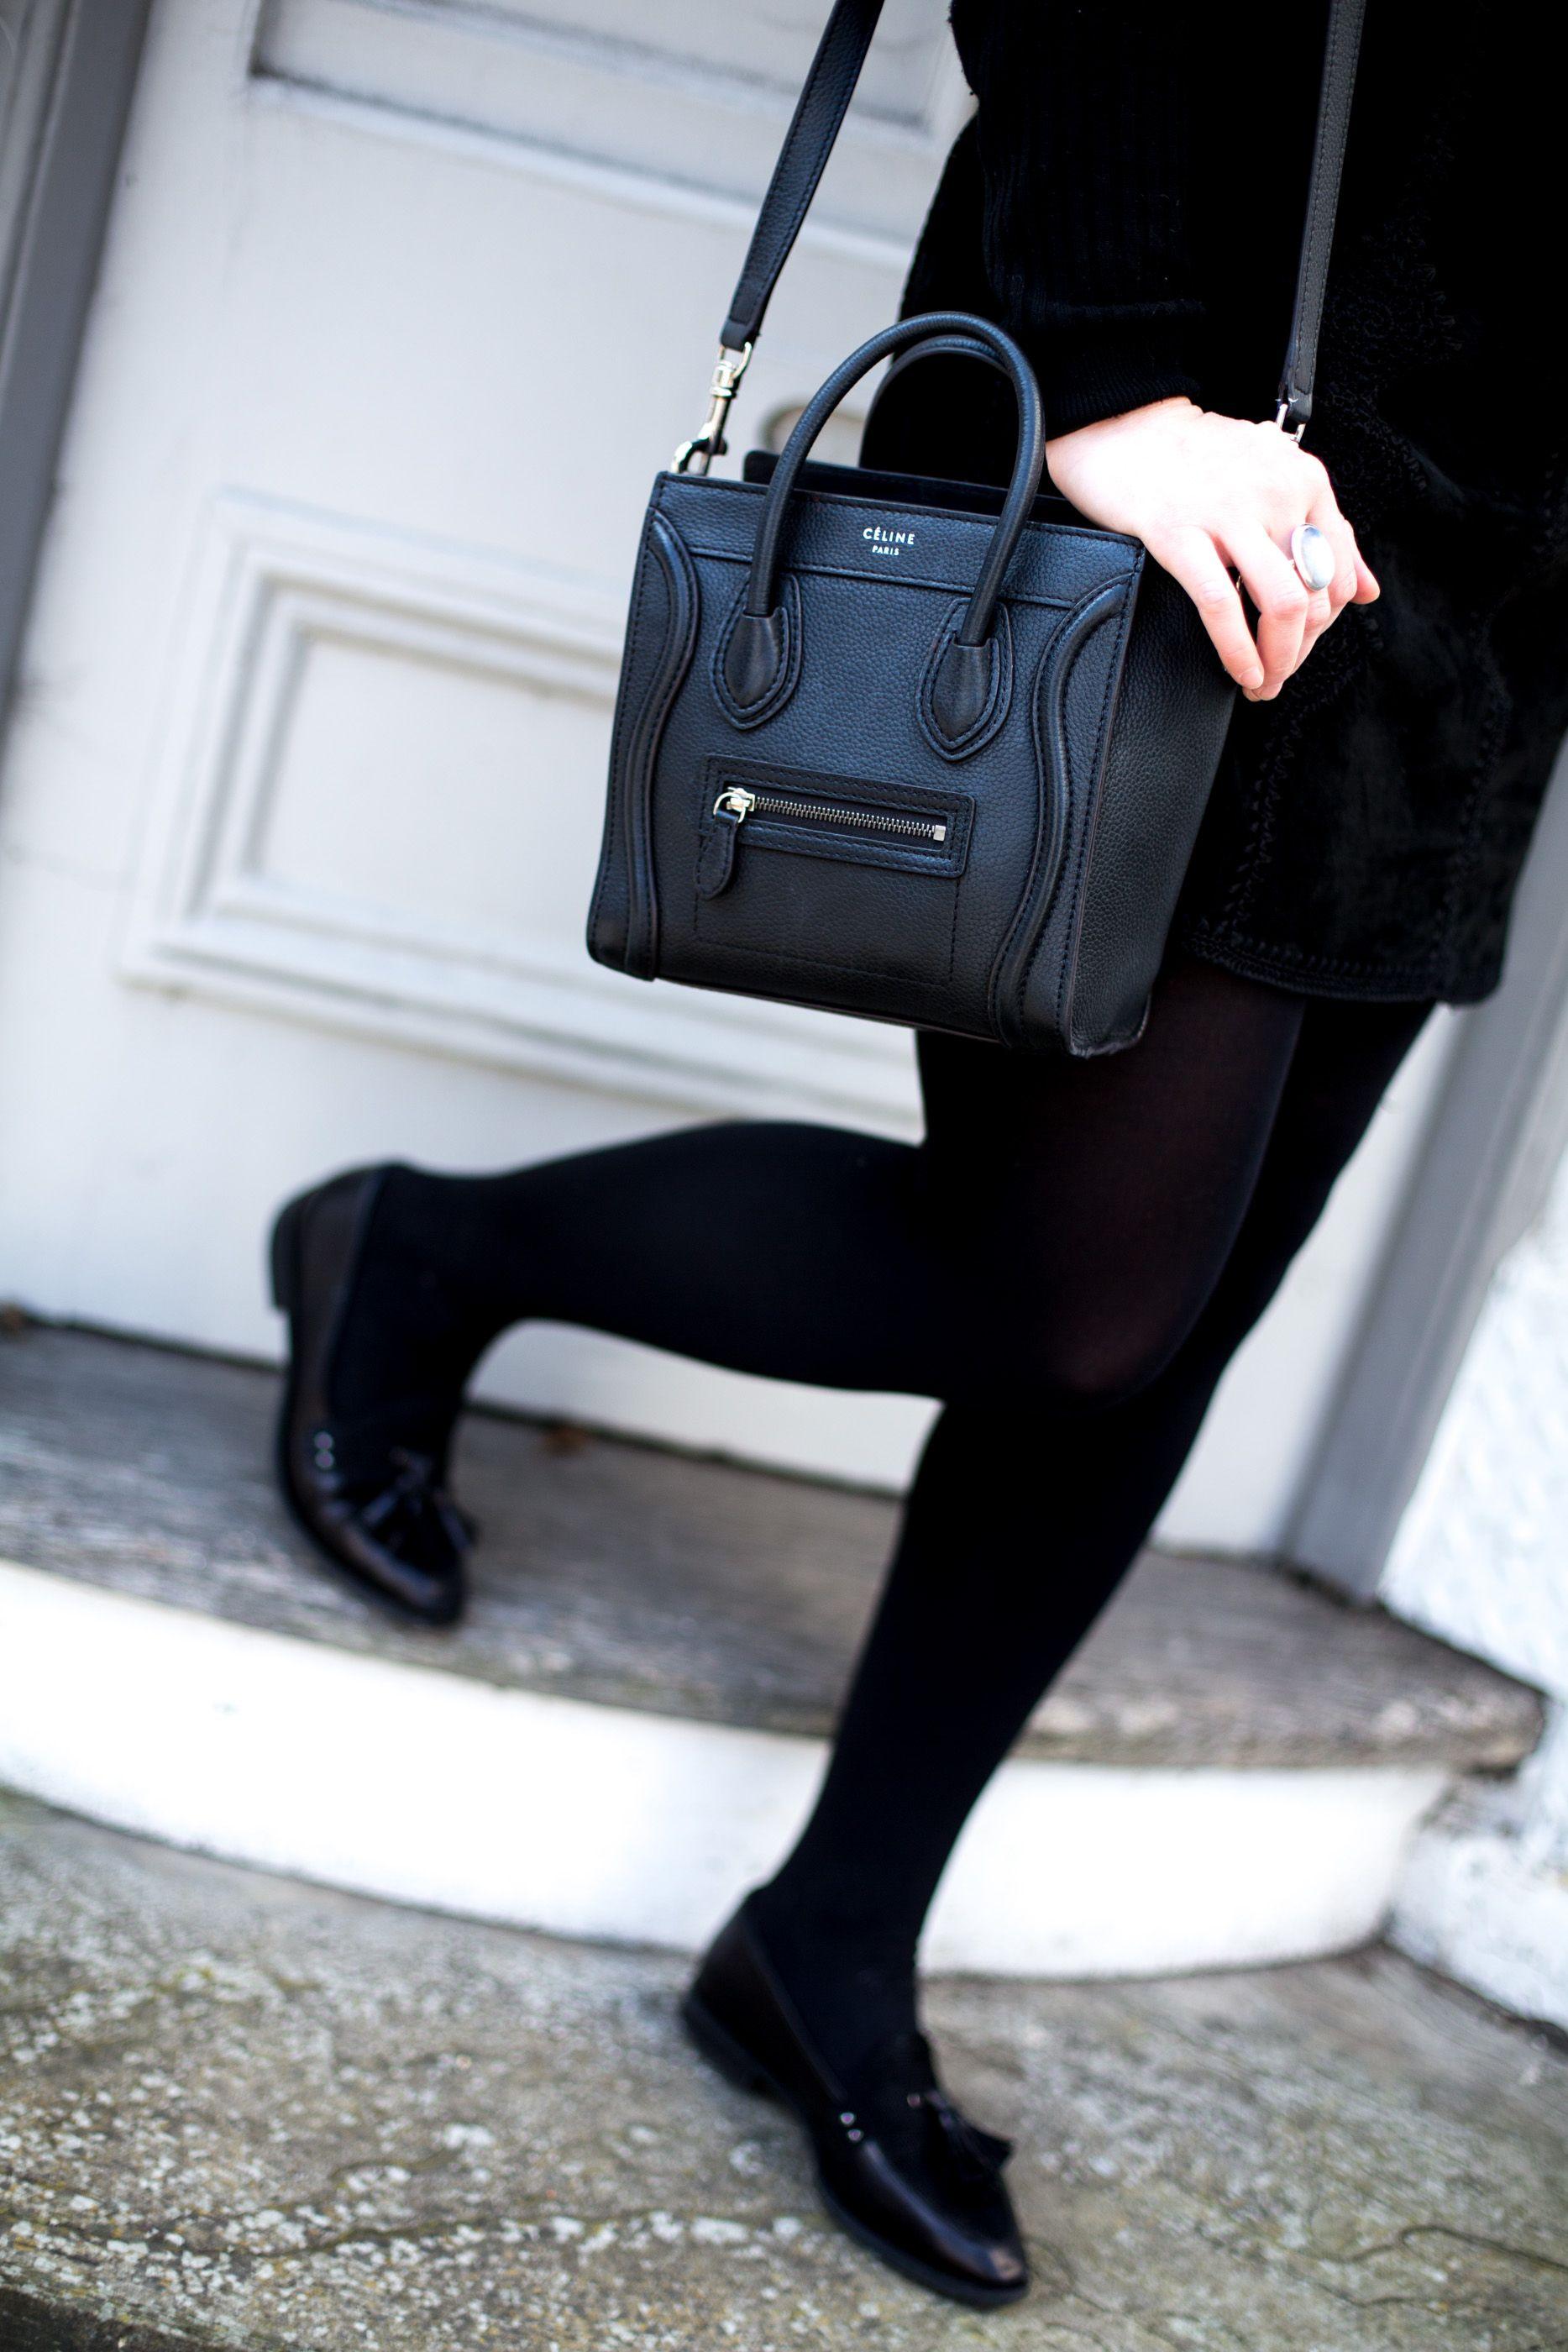 cf6b9172d16 Celine Nano - Mediamarmalade Celine Nano Luggage, Career Success, Staying  Positive, Luxury Handbags